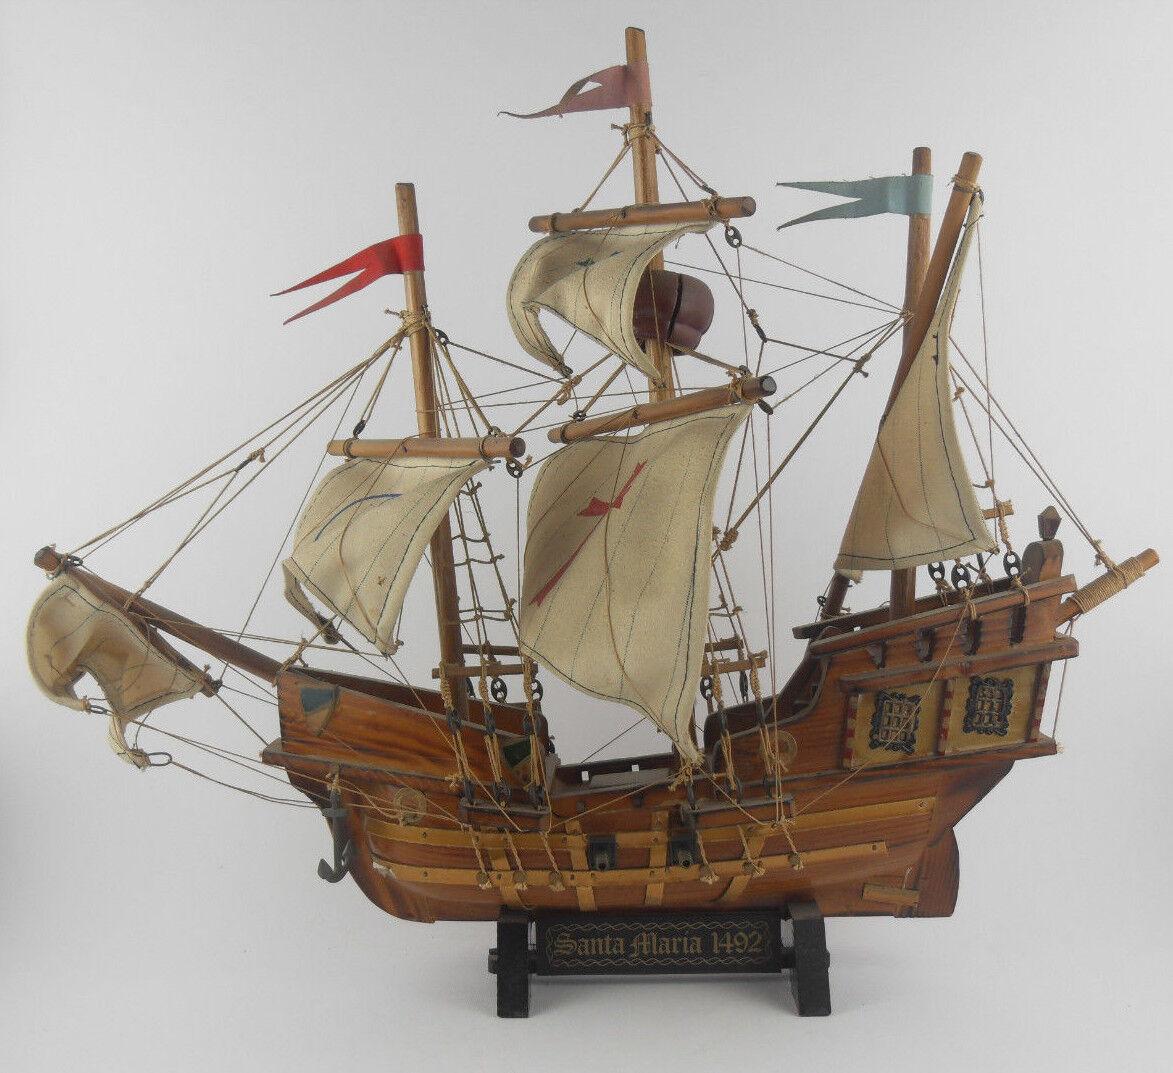 Veliero SANTA MARIA 1492 1492 Modellino Barca Nave in Legno VINTAGE Boat